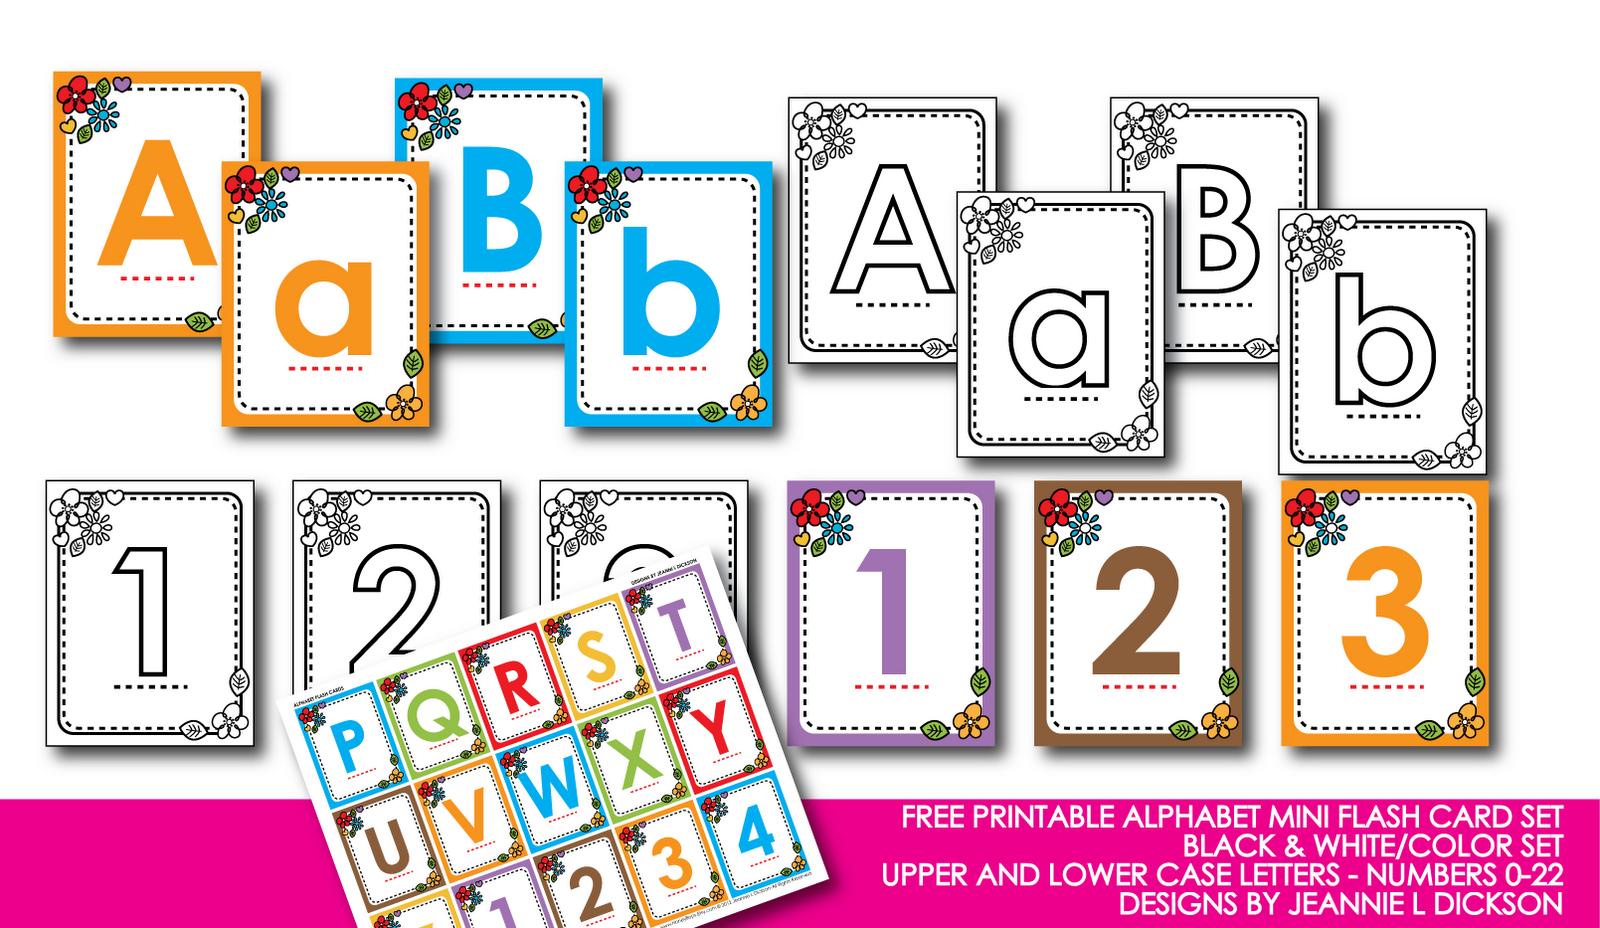 Printable Flash Cards Alphabet Printables Abc Flashcards